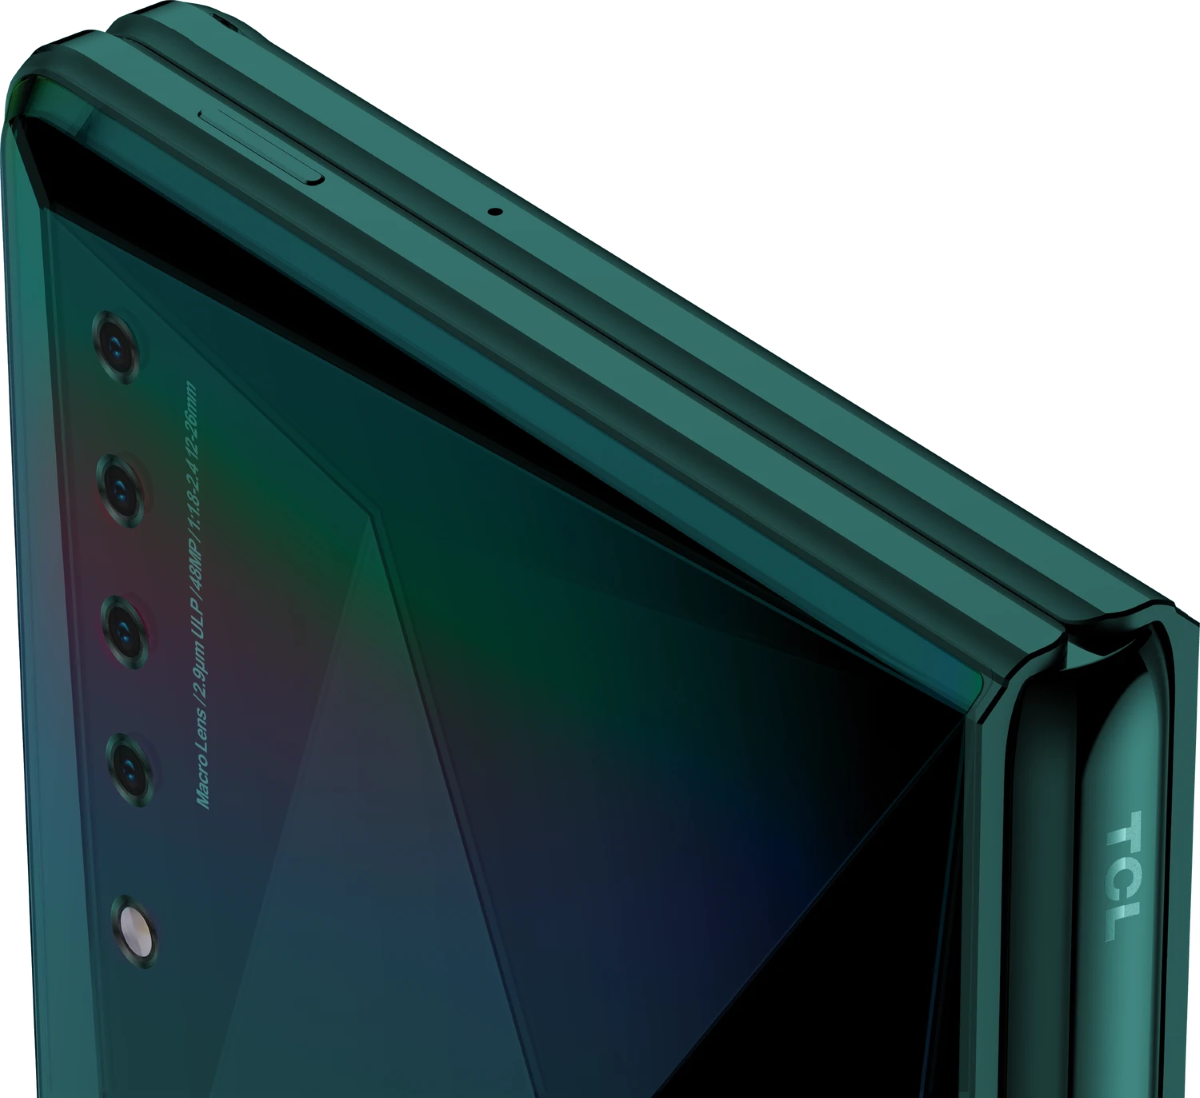 TCL - Foldable Smartphone Prototype (2)